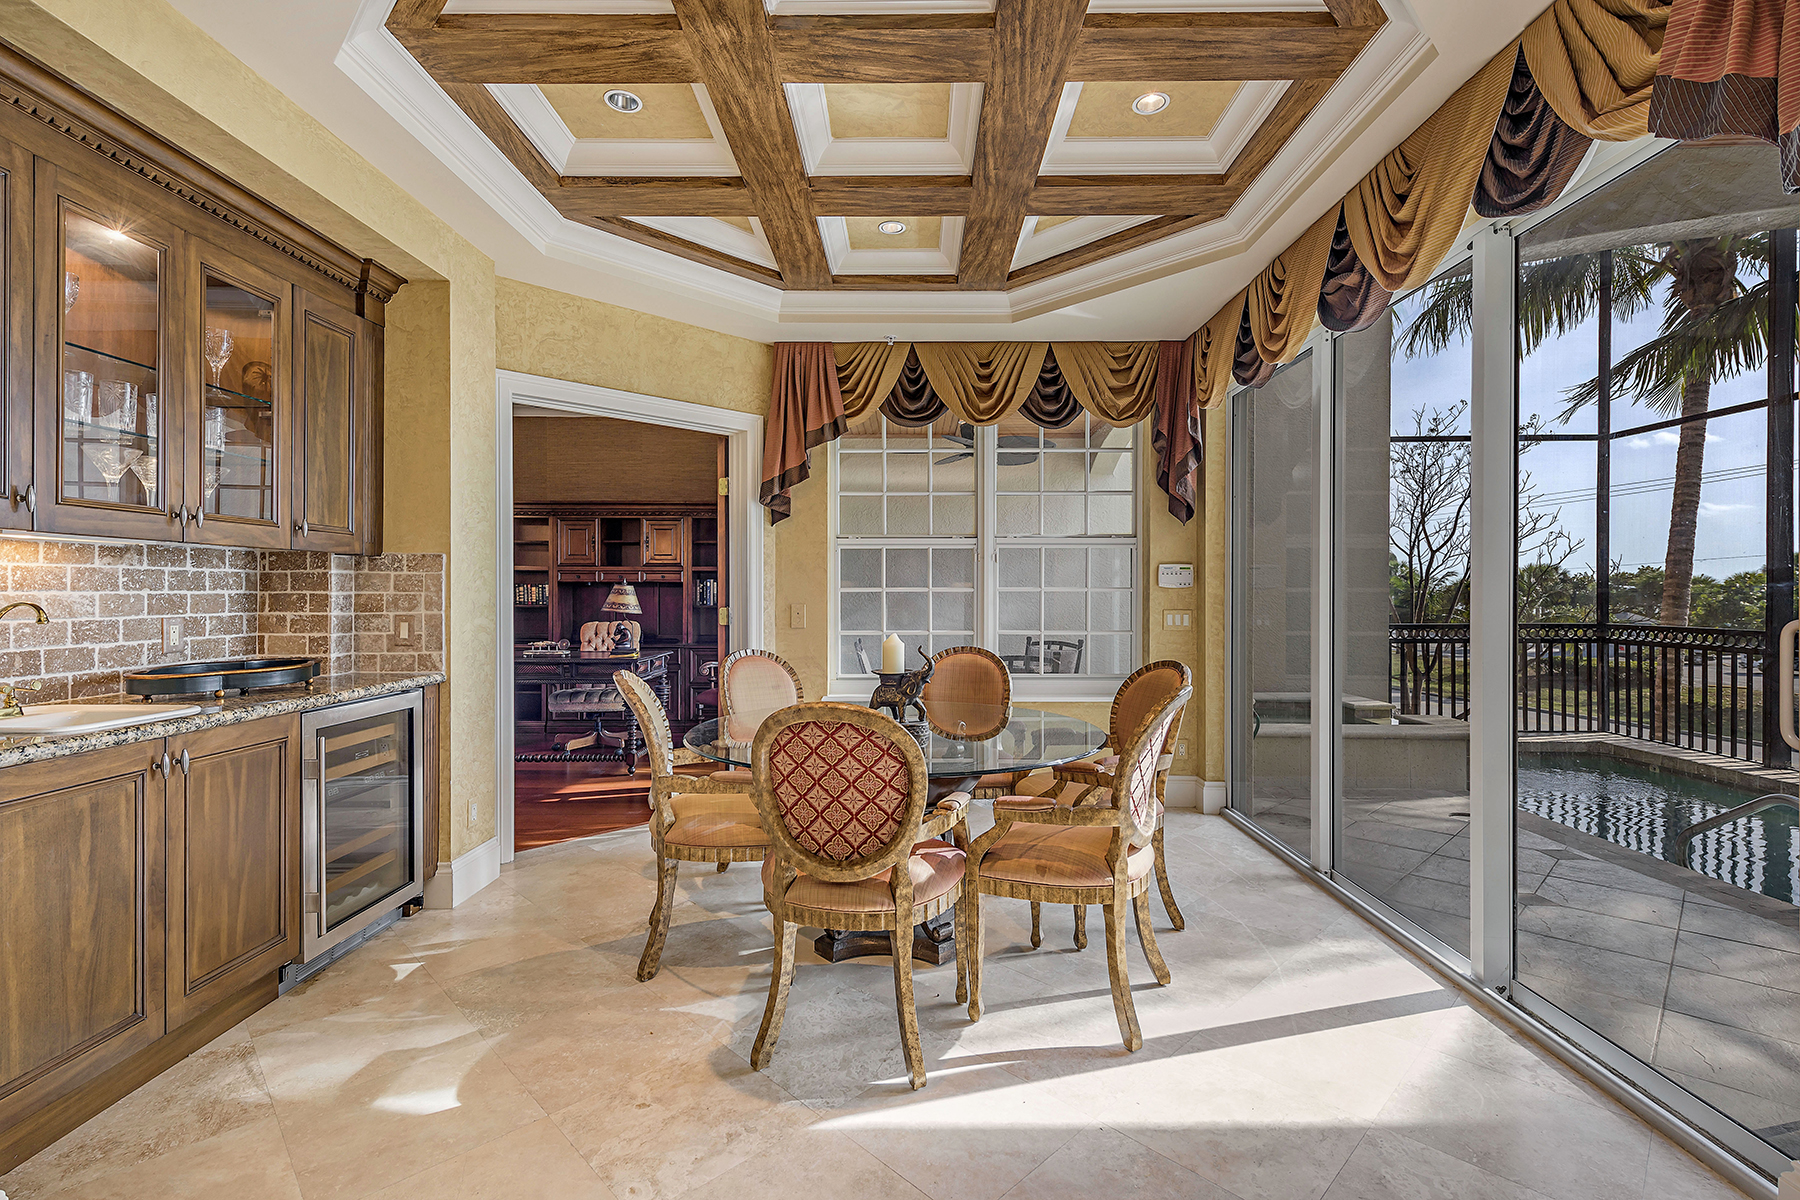 Additional photo for property listing at Bonita Springs 25961  Hickory Blvd 3,  Bonita Springs, Florida 34134 United States